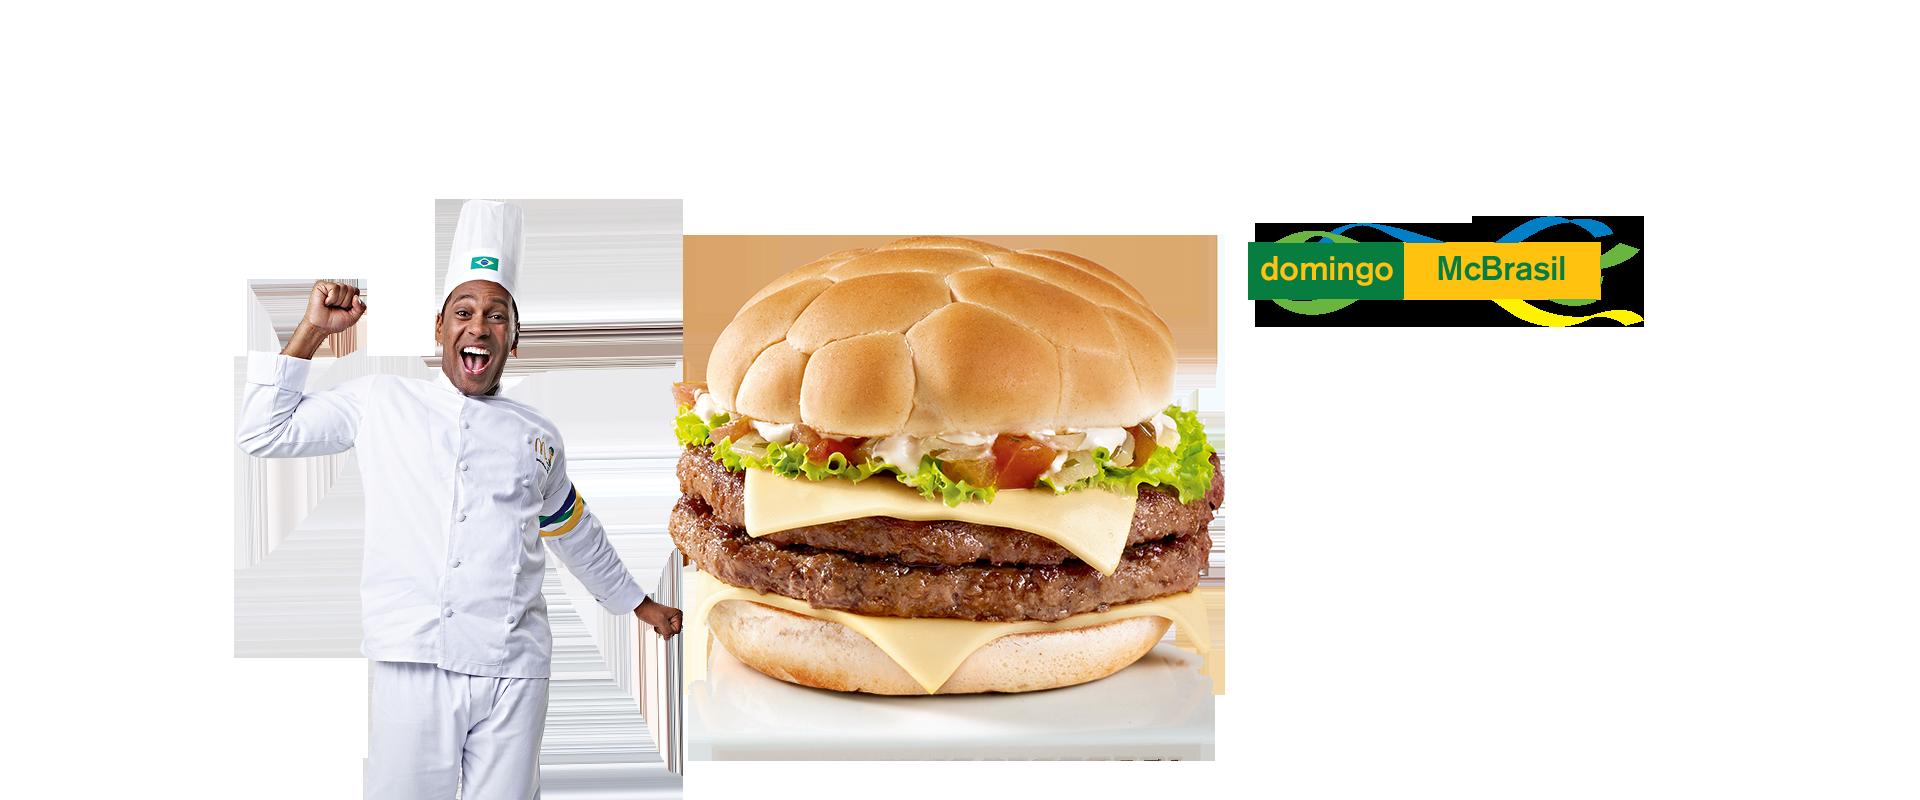 Burger McBrasil  McDonald's - Coupe du Monde 2014 (Brésil)